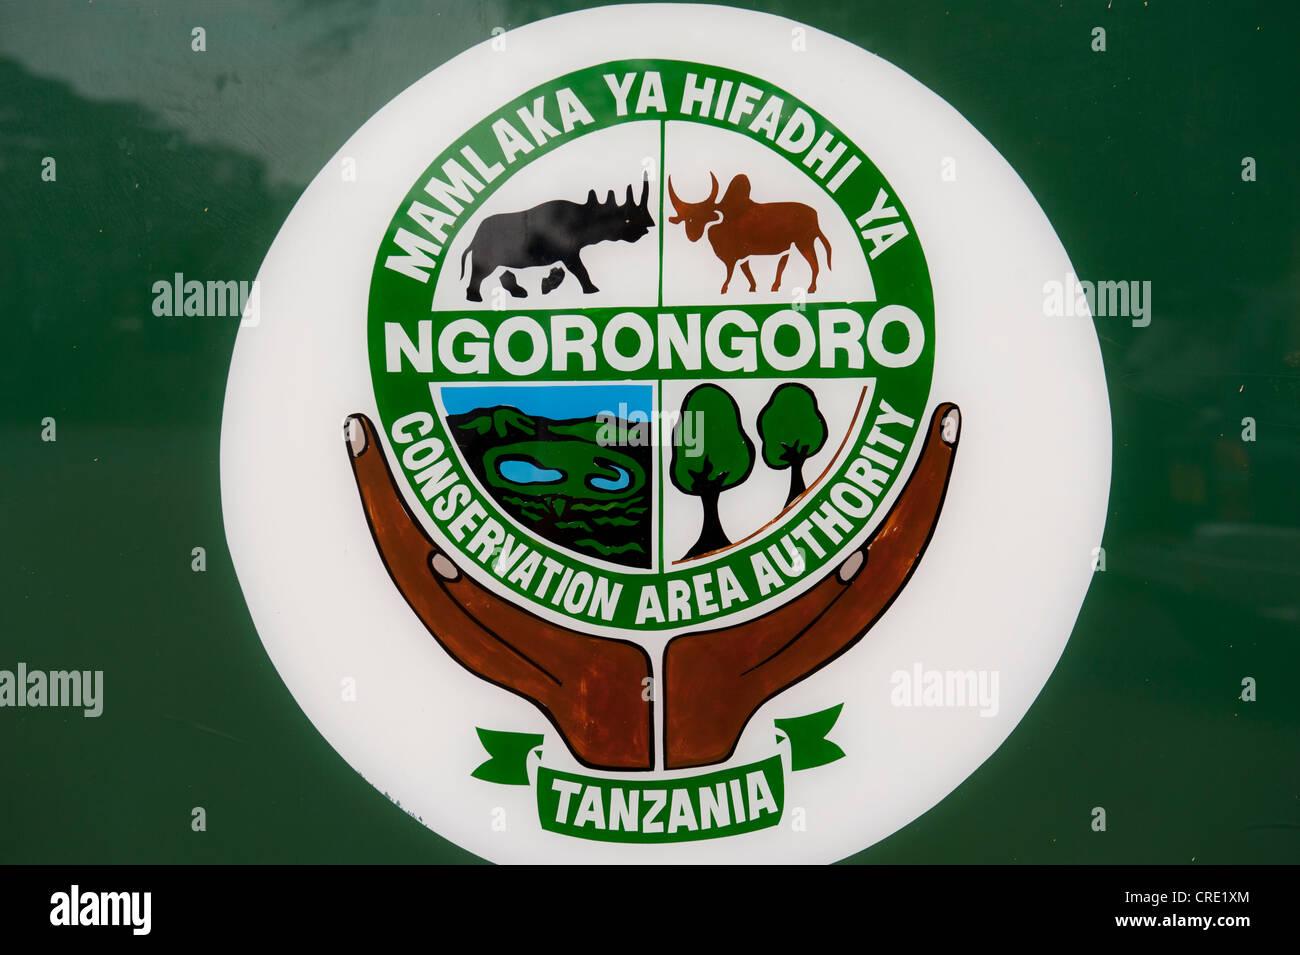 Conservation and tourism, sign and symbol, Ngorongoro Conservation Area Authority, Serengeti National Park, Tanzania - Stock Image